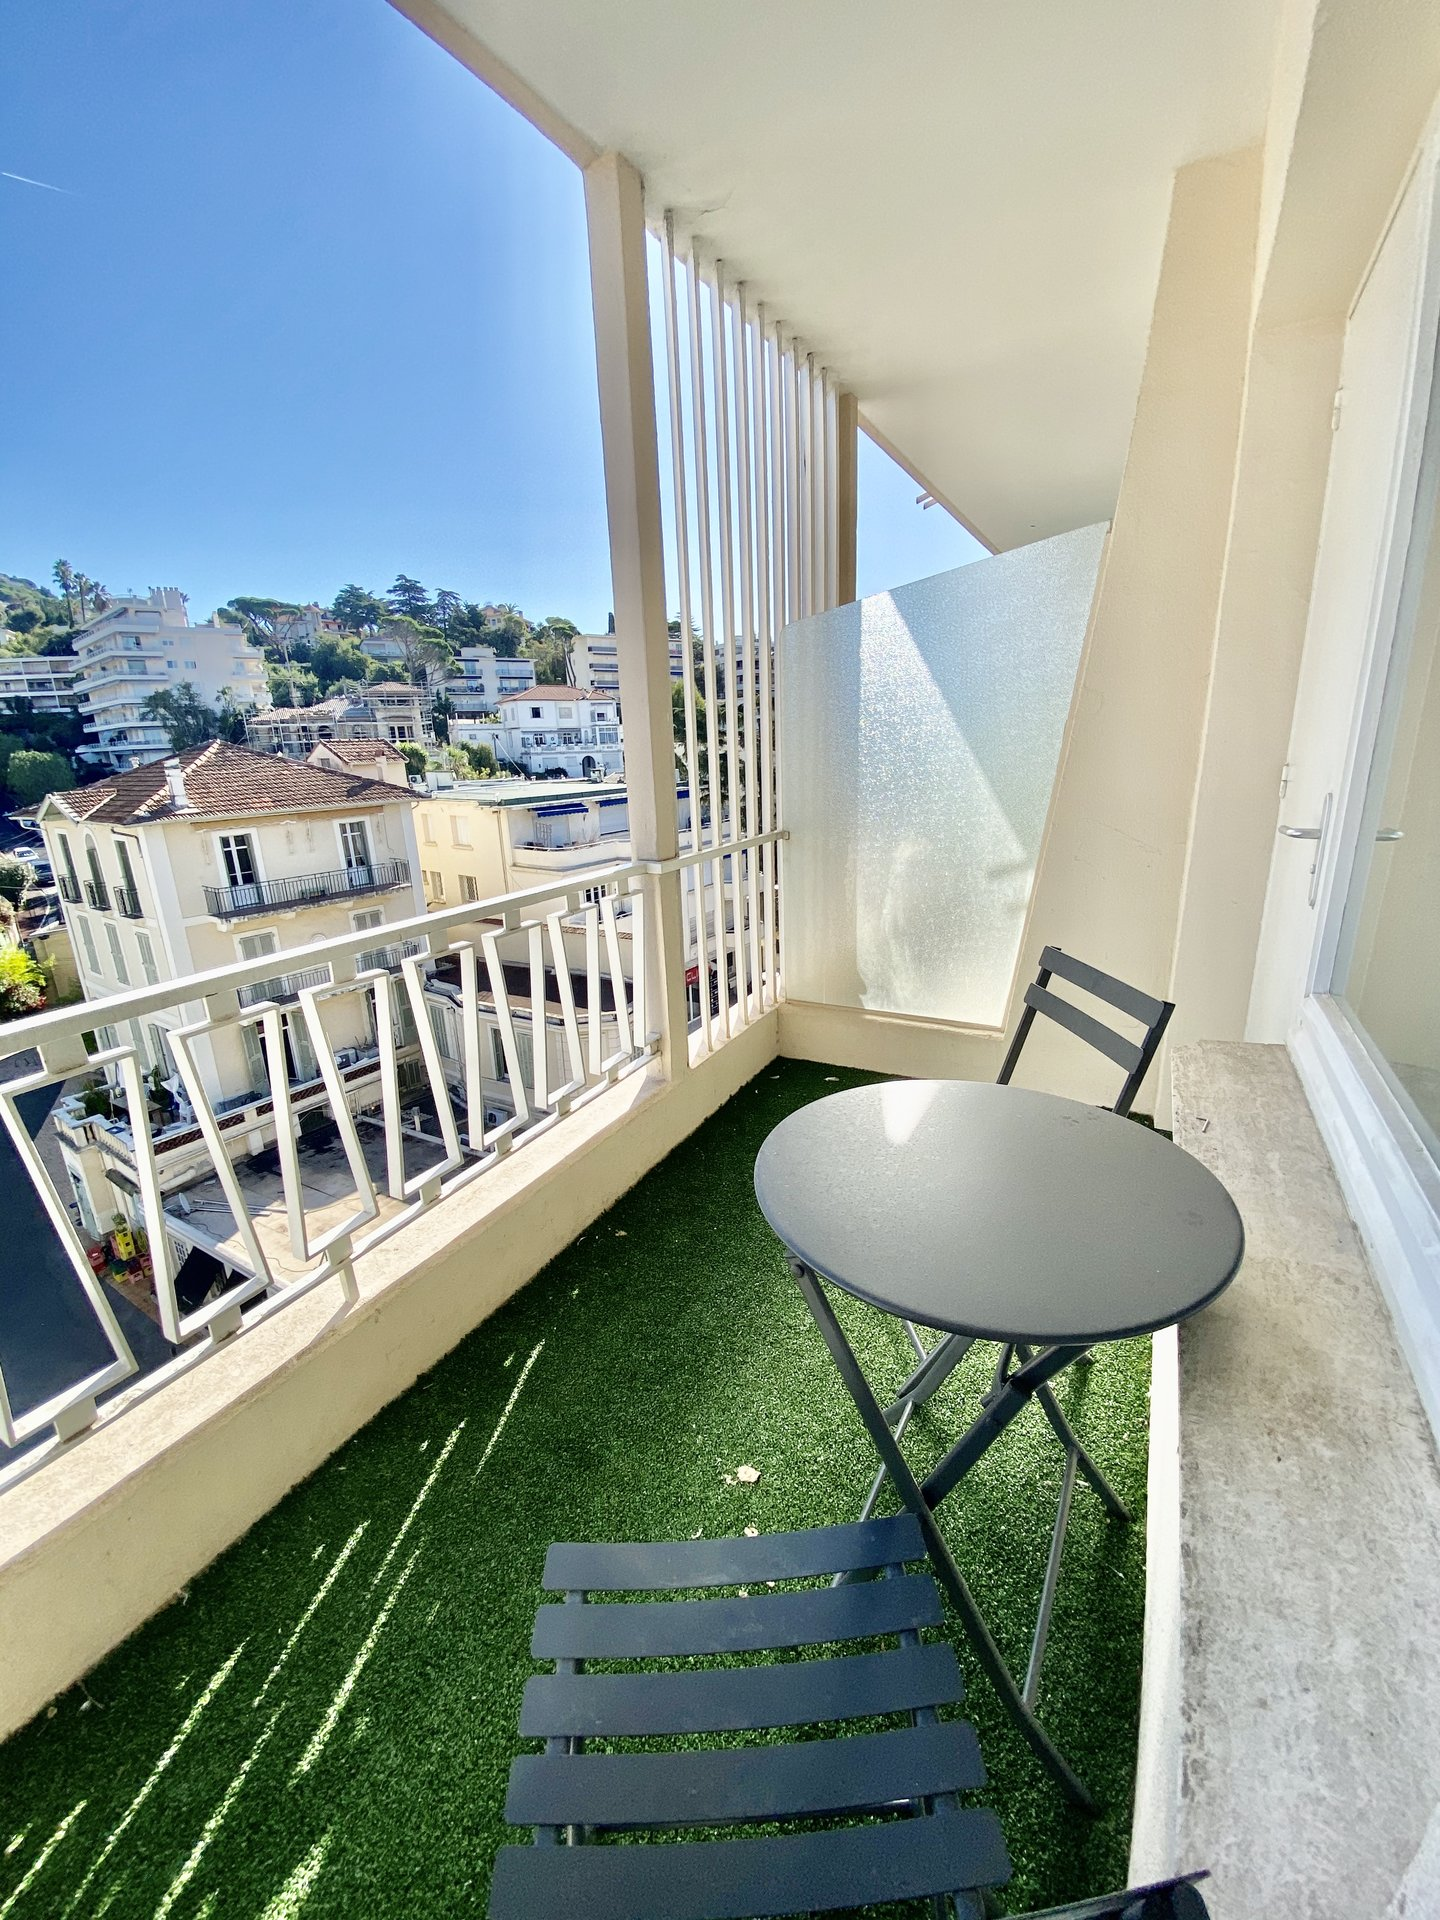 Affitto Appartamento - Cannes Basse Californie